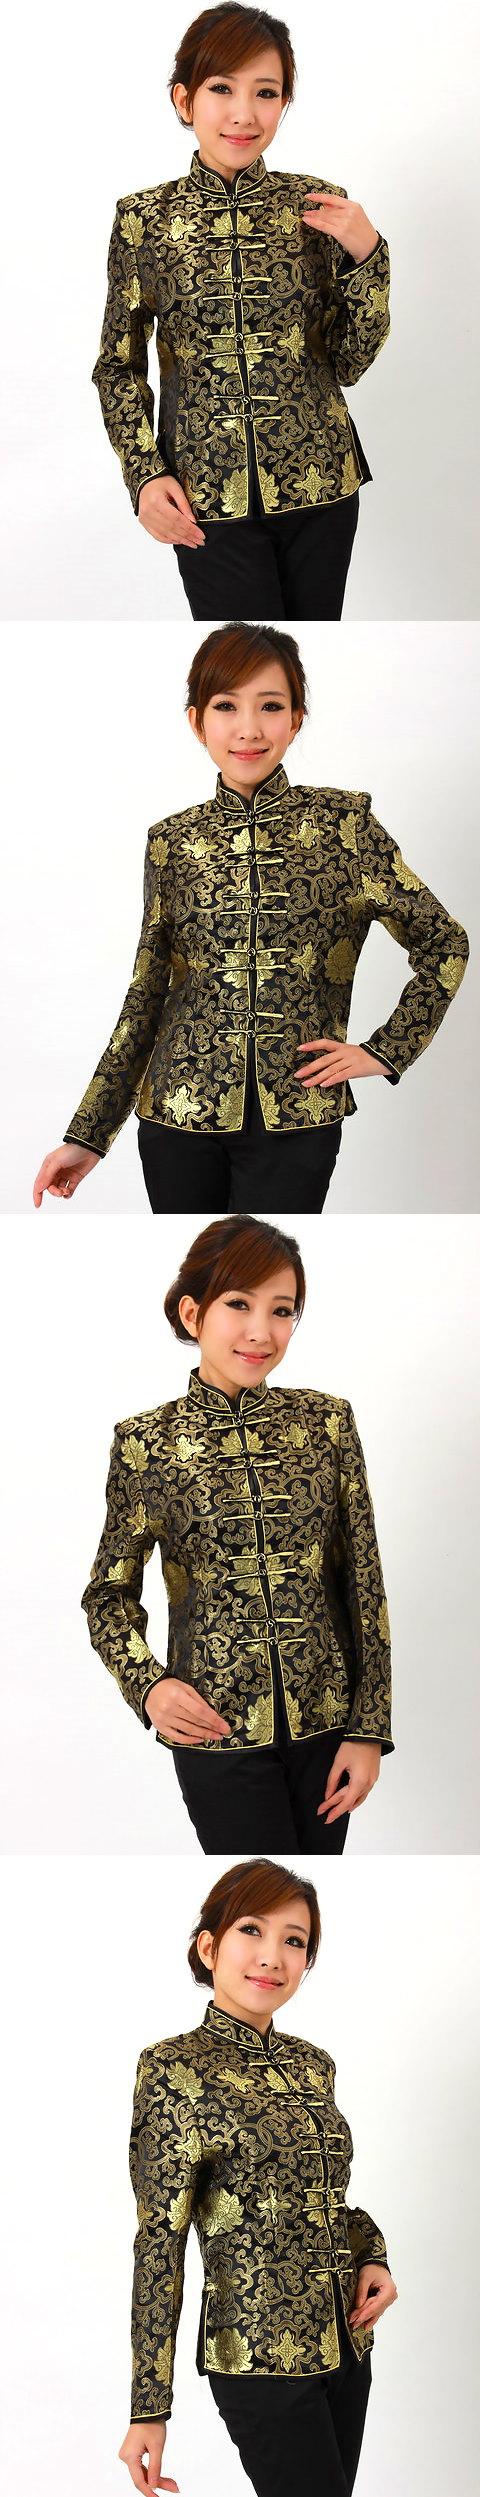 Mandarin Collar Embroidery Chinese Jacket (CM)